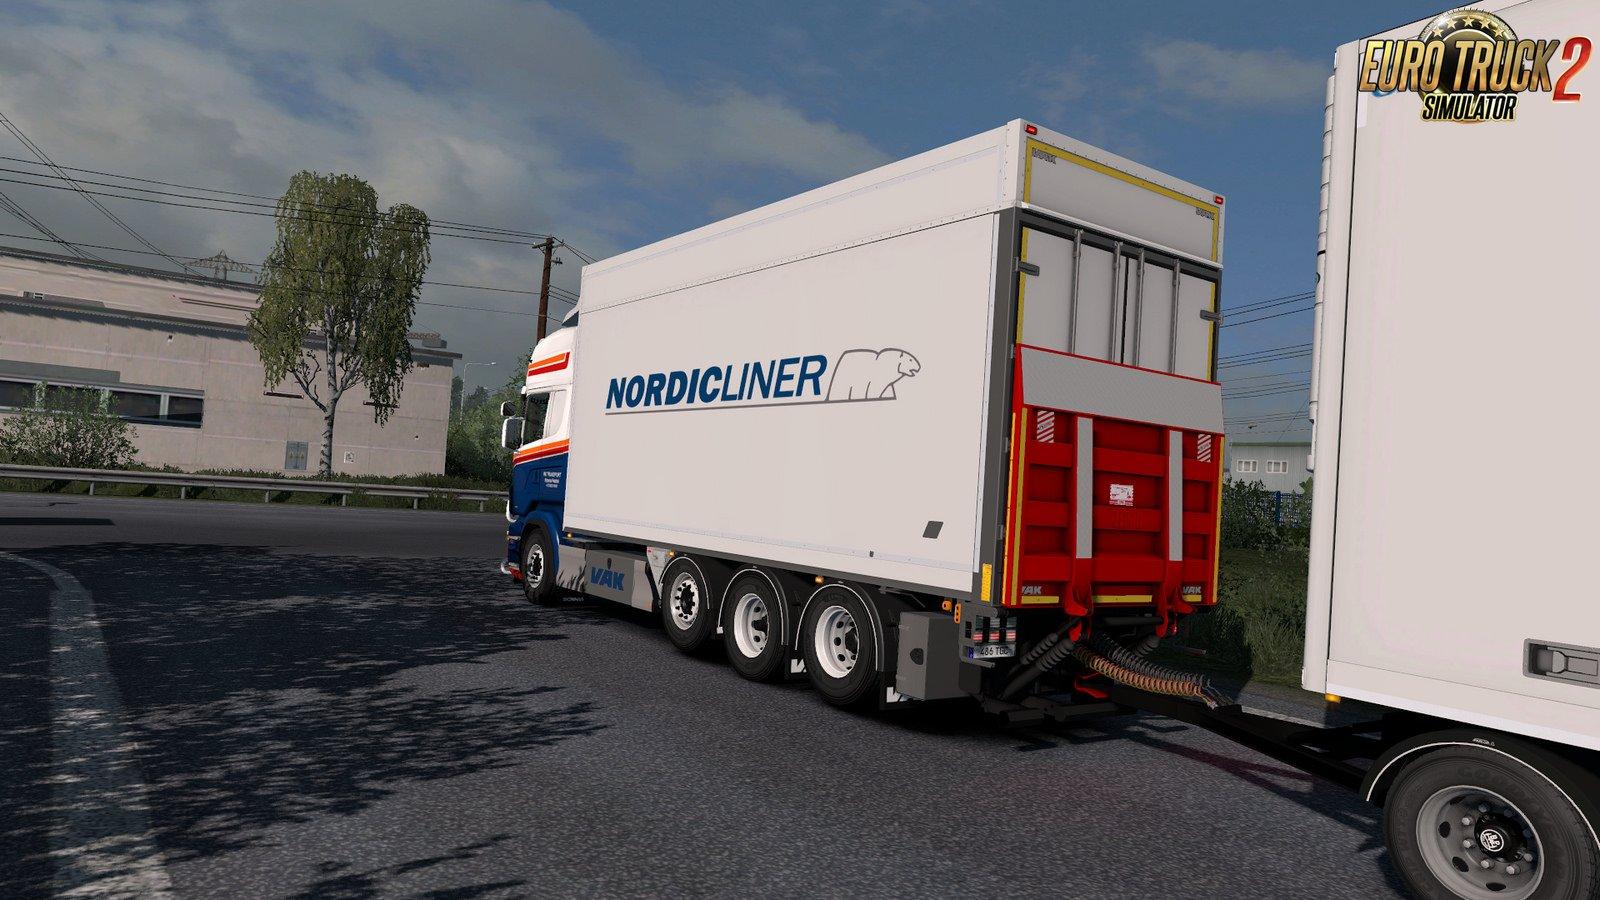 VAK Trailers + all Addons by Kast [1.31.x] | ETS2 mods | Euro truck simulator 2 mods - ETS2MODS.LT